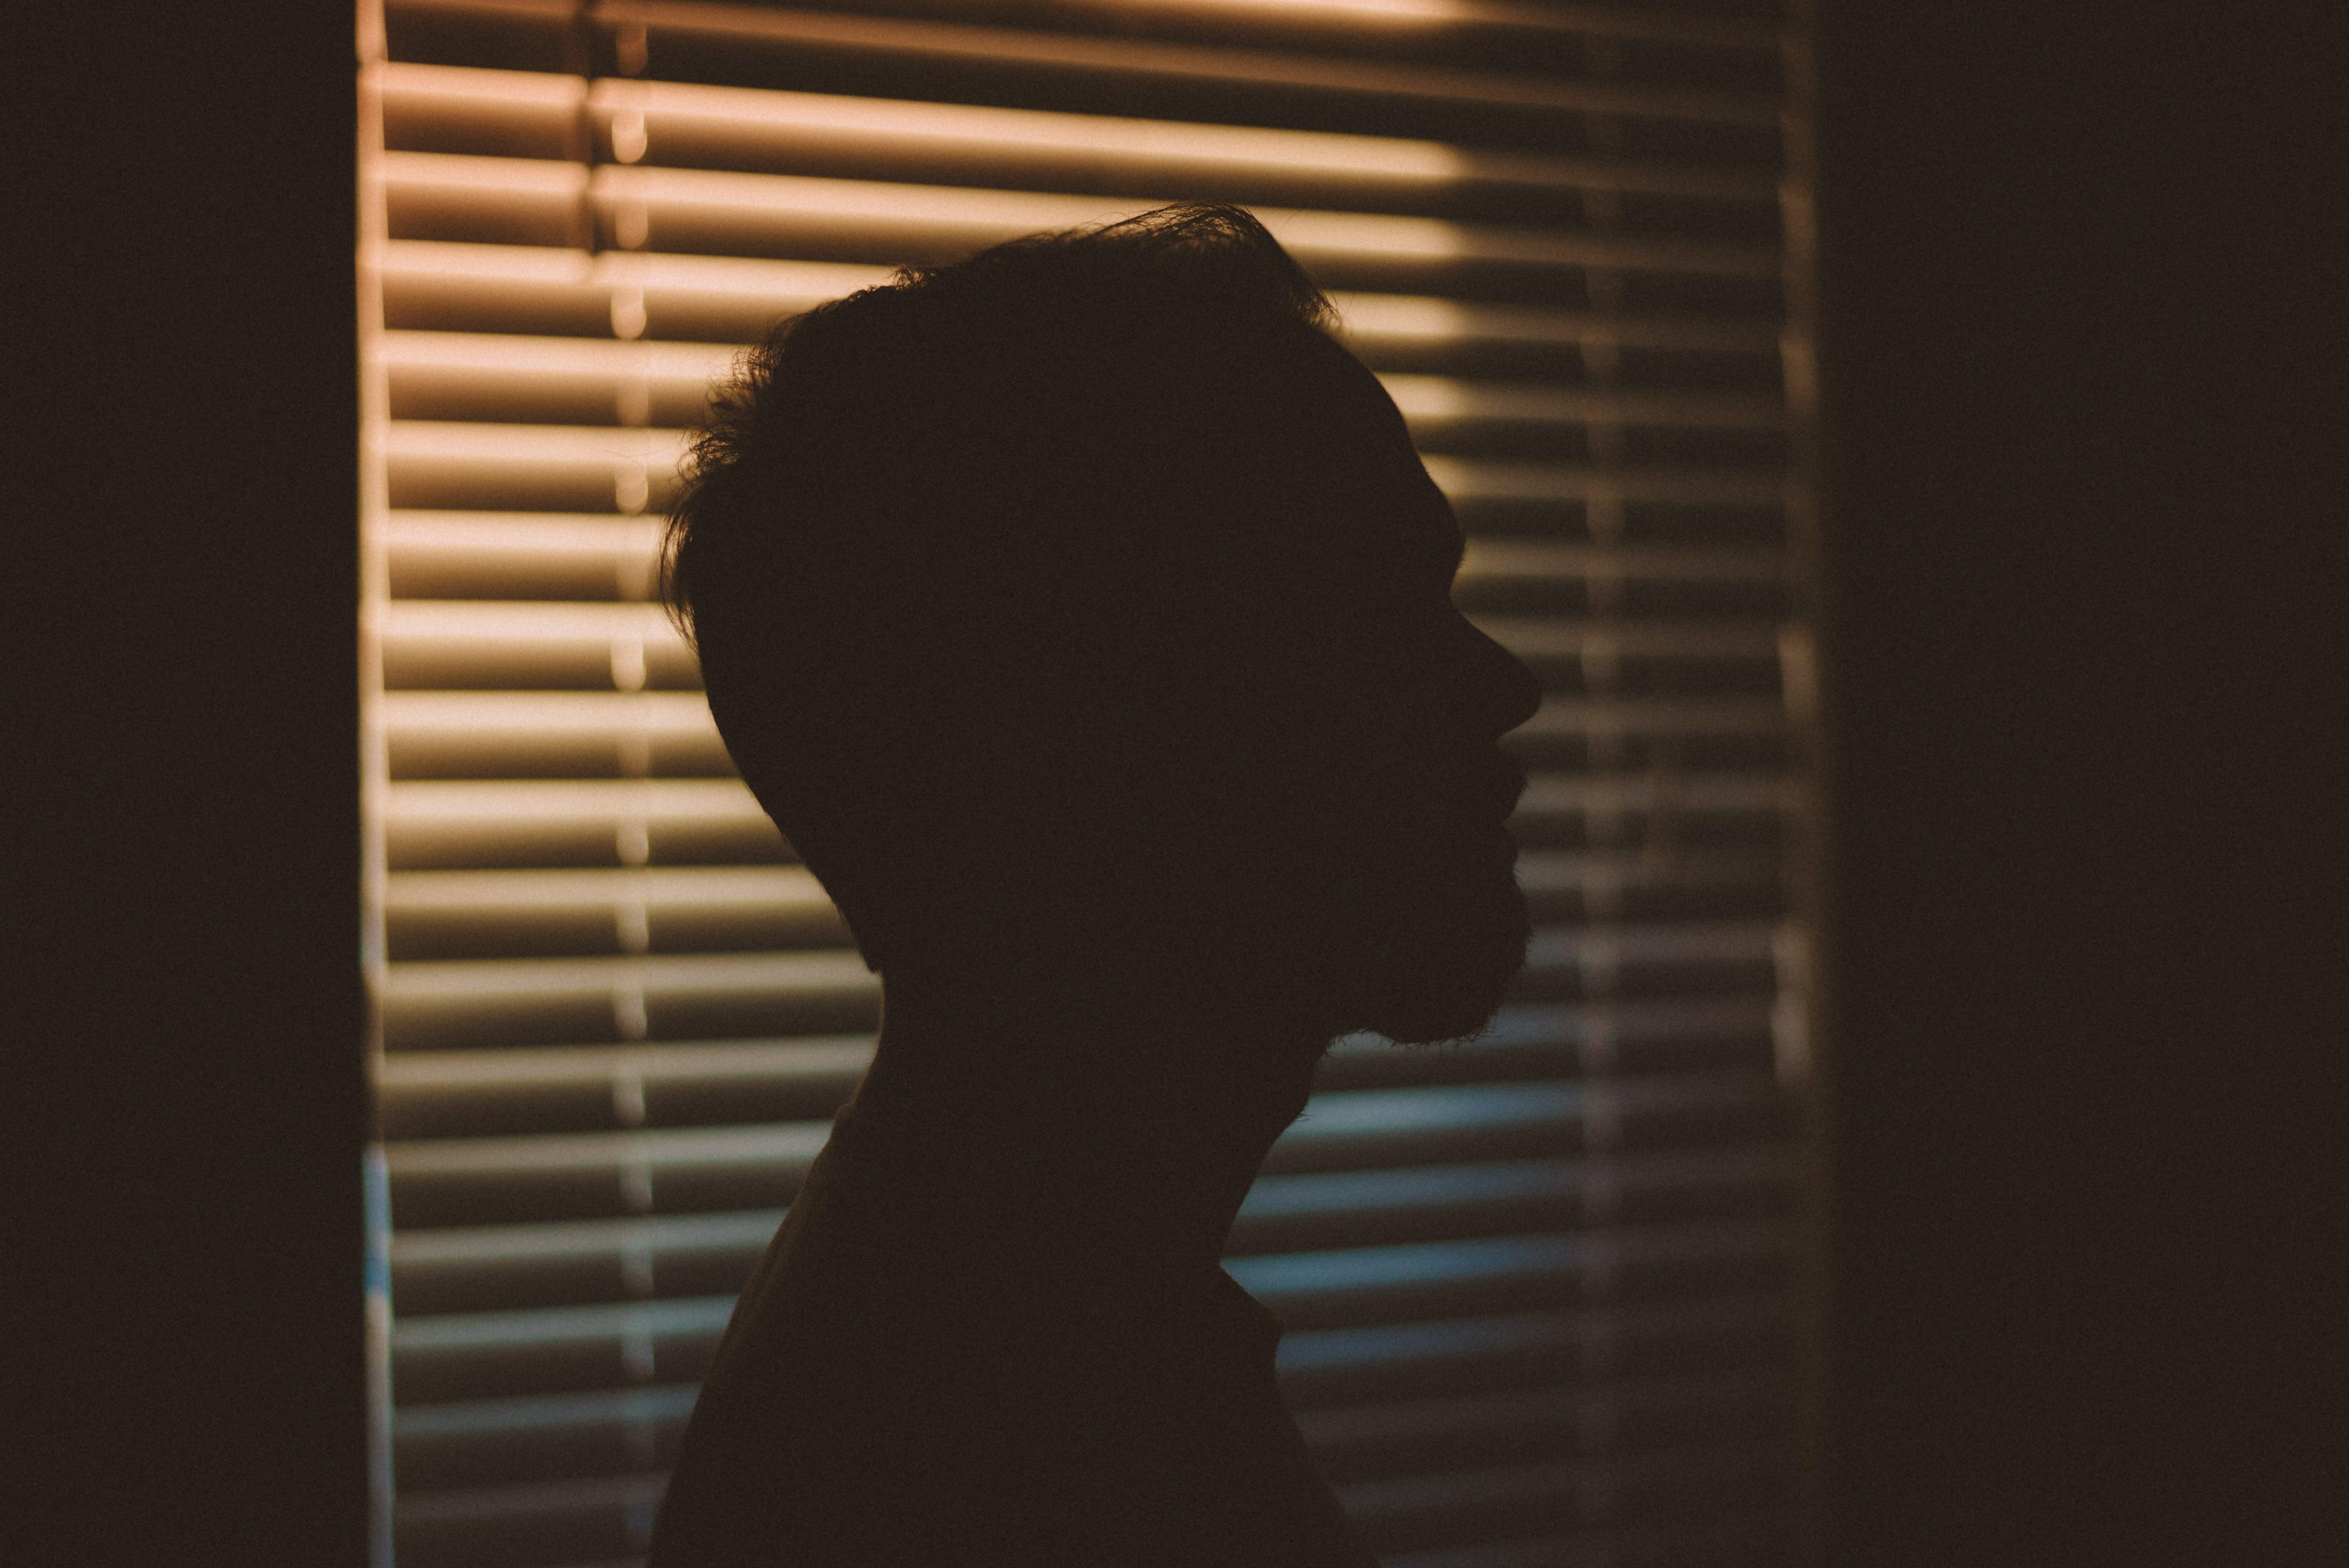 Man's Silhouette Near White Window Blinds